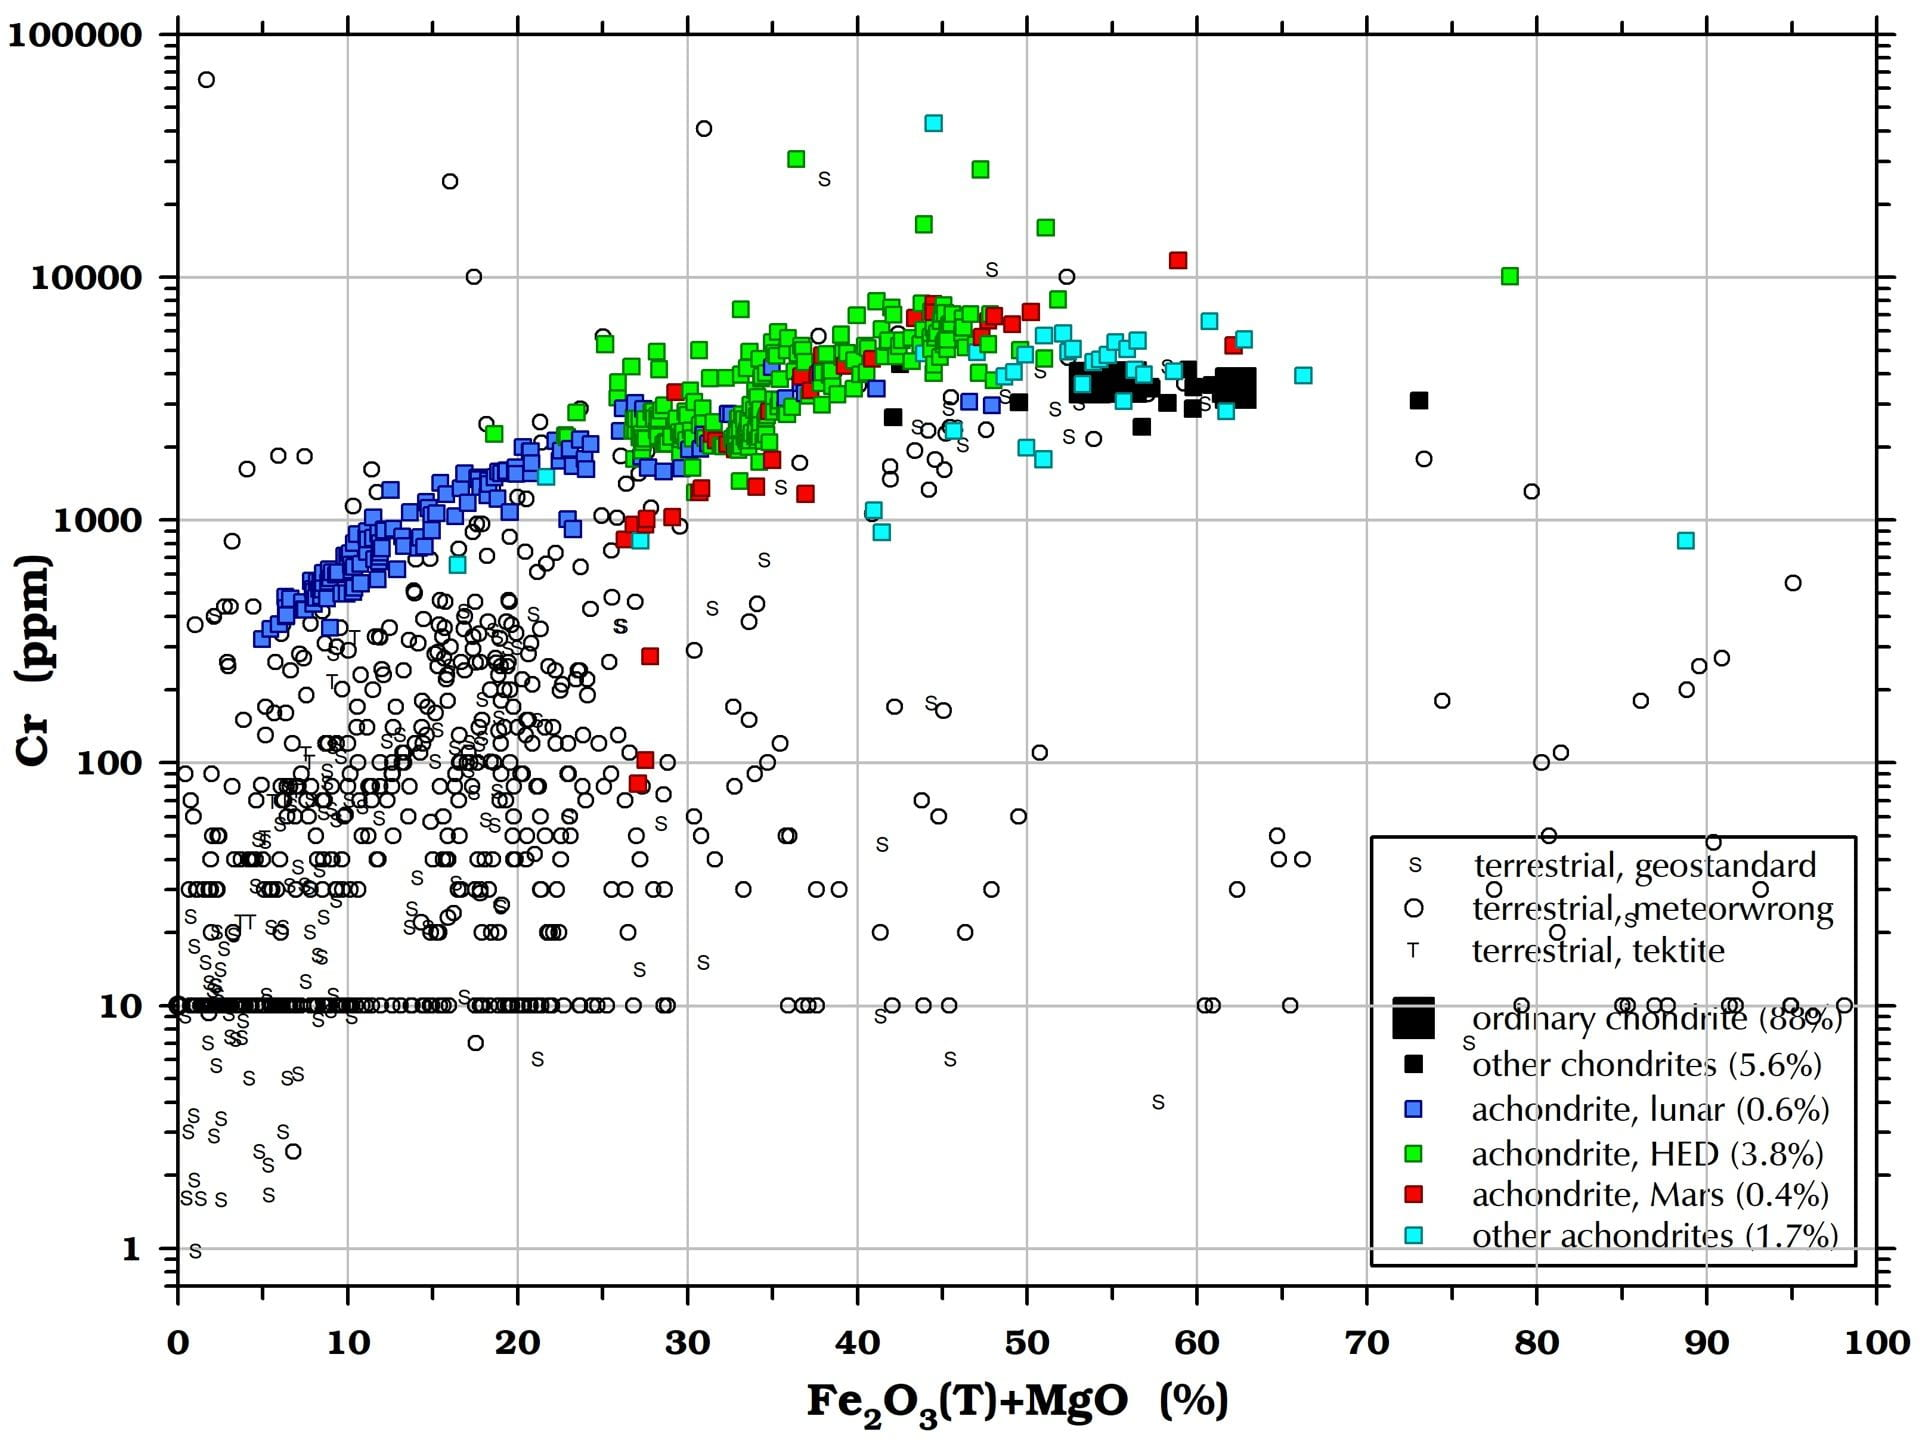 Chromium (Cr) in meteorites and terrestrial rocks